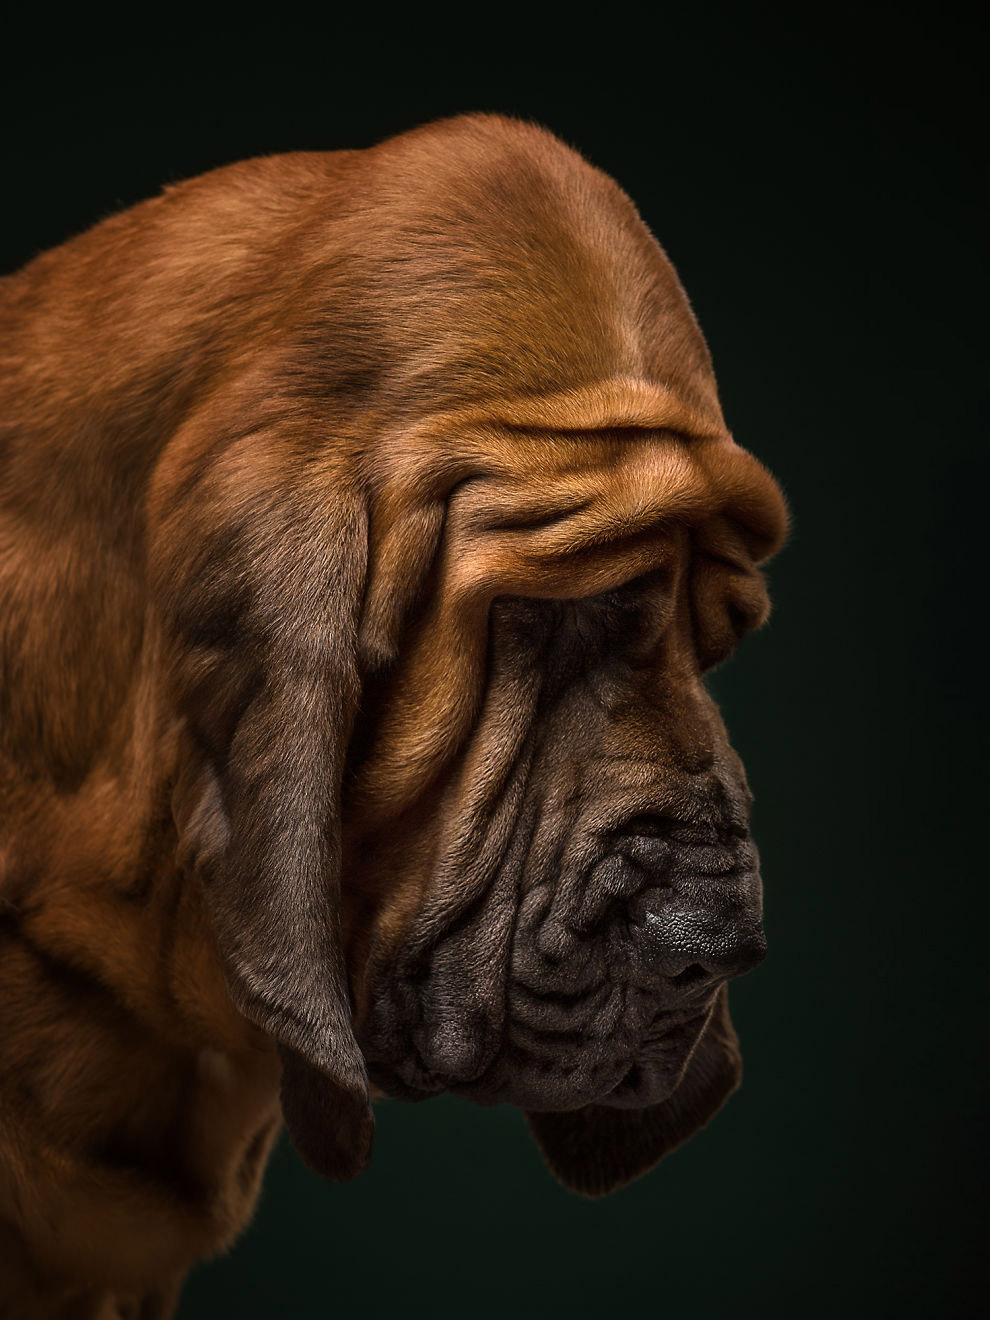 Бладхаунд - порода собак, виведена в Бельгії